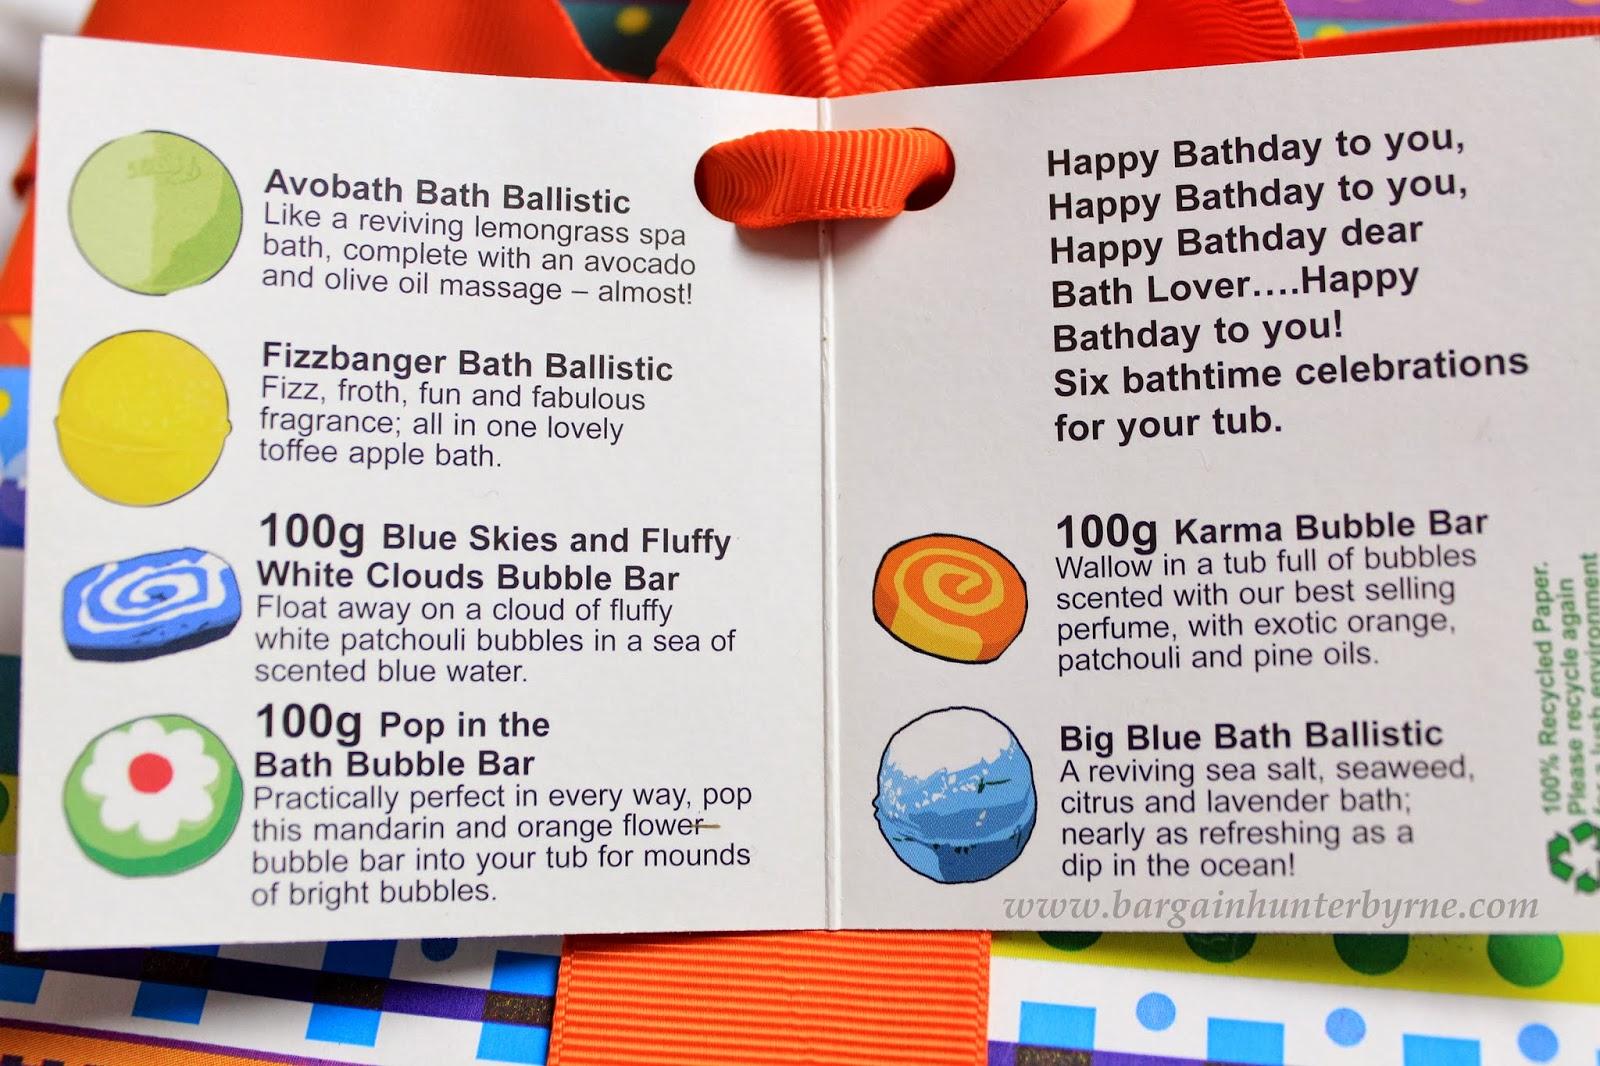 Eimear McElheron : Lush Happy Bathday Gift Box